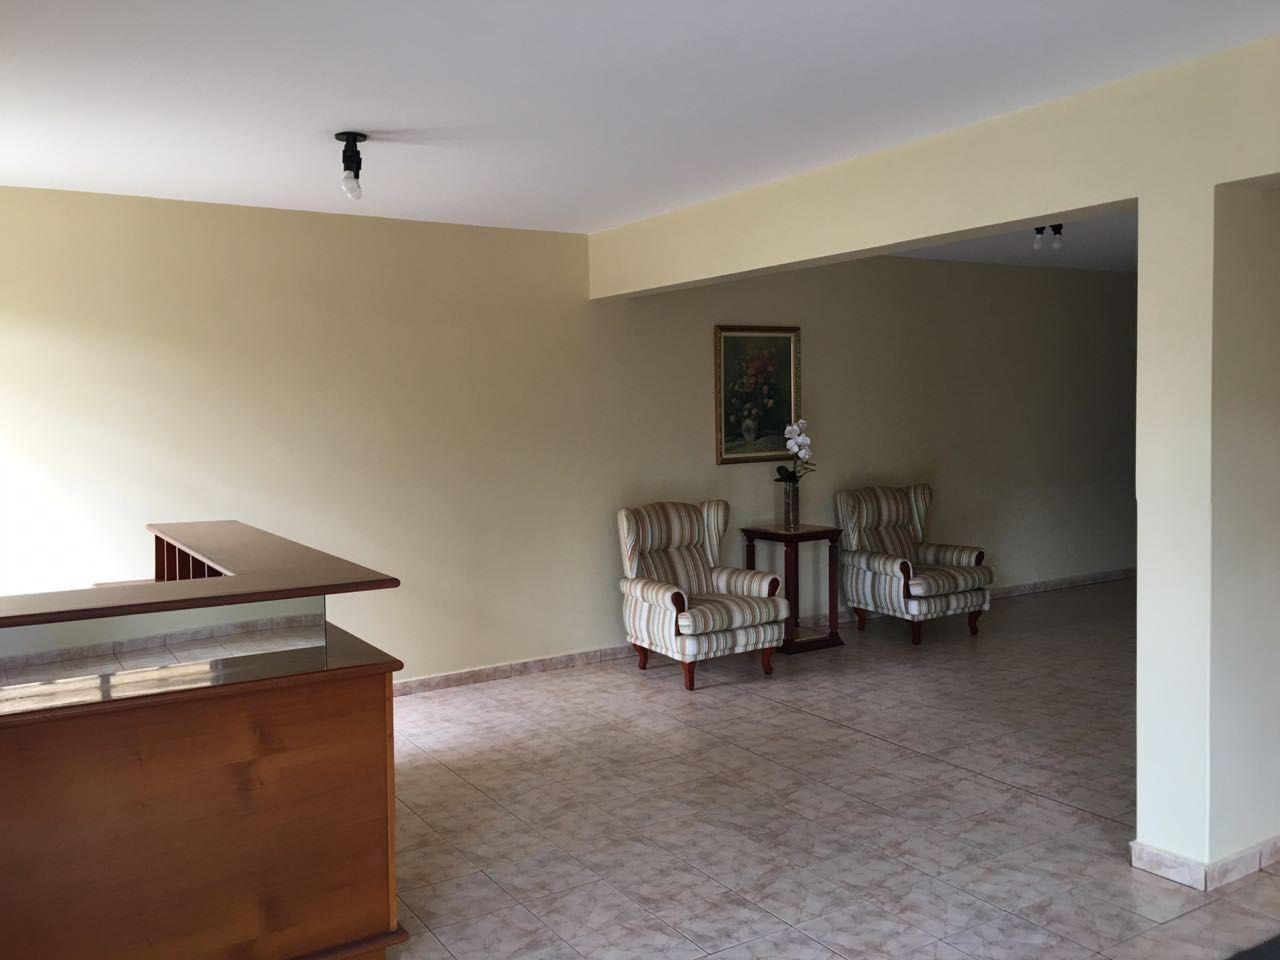 604 - Apto jardim Irajá 87 m² VENDIDO